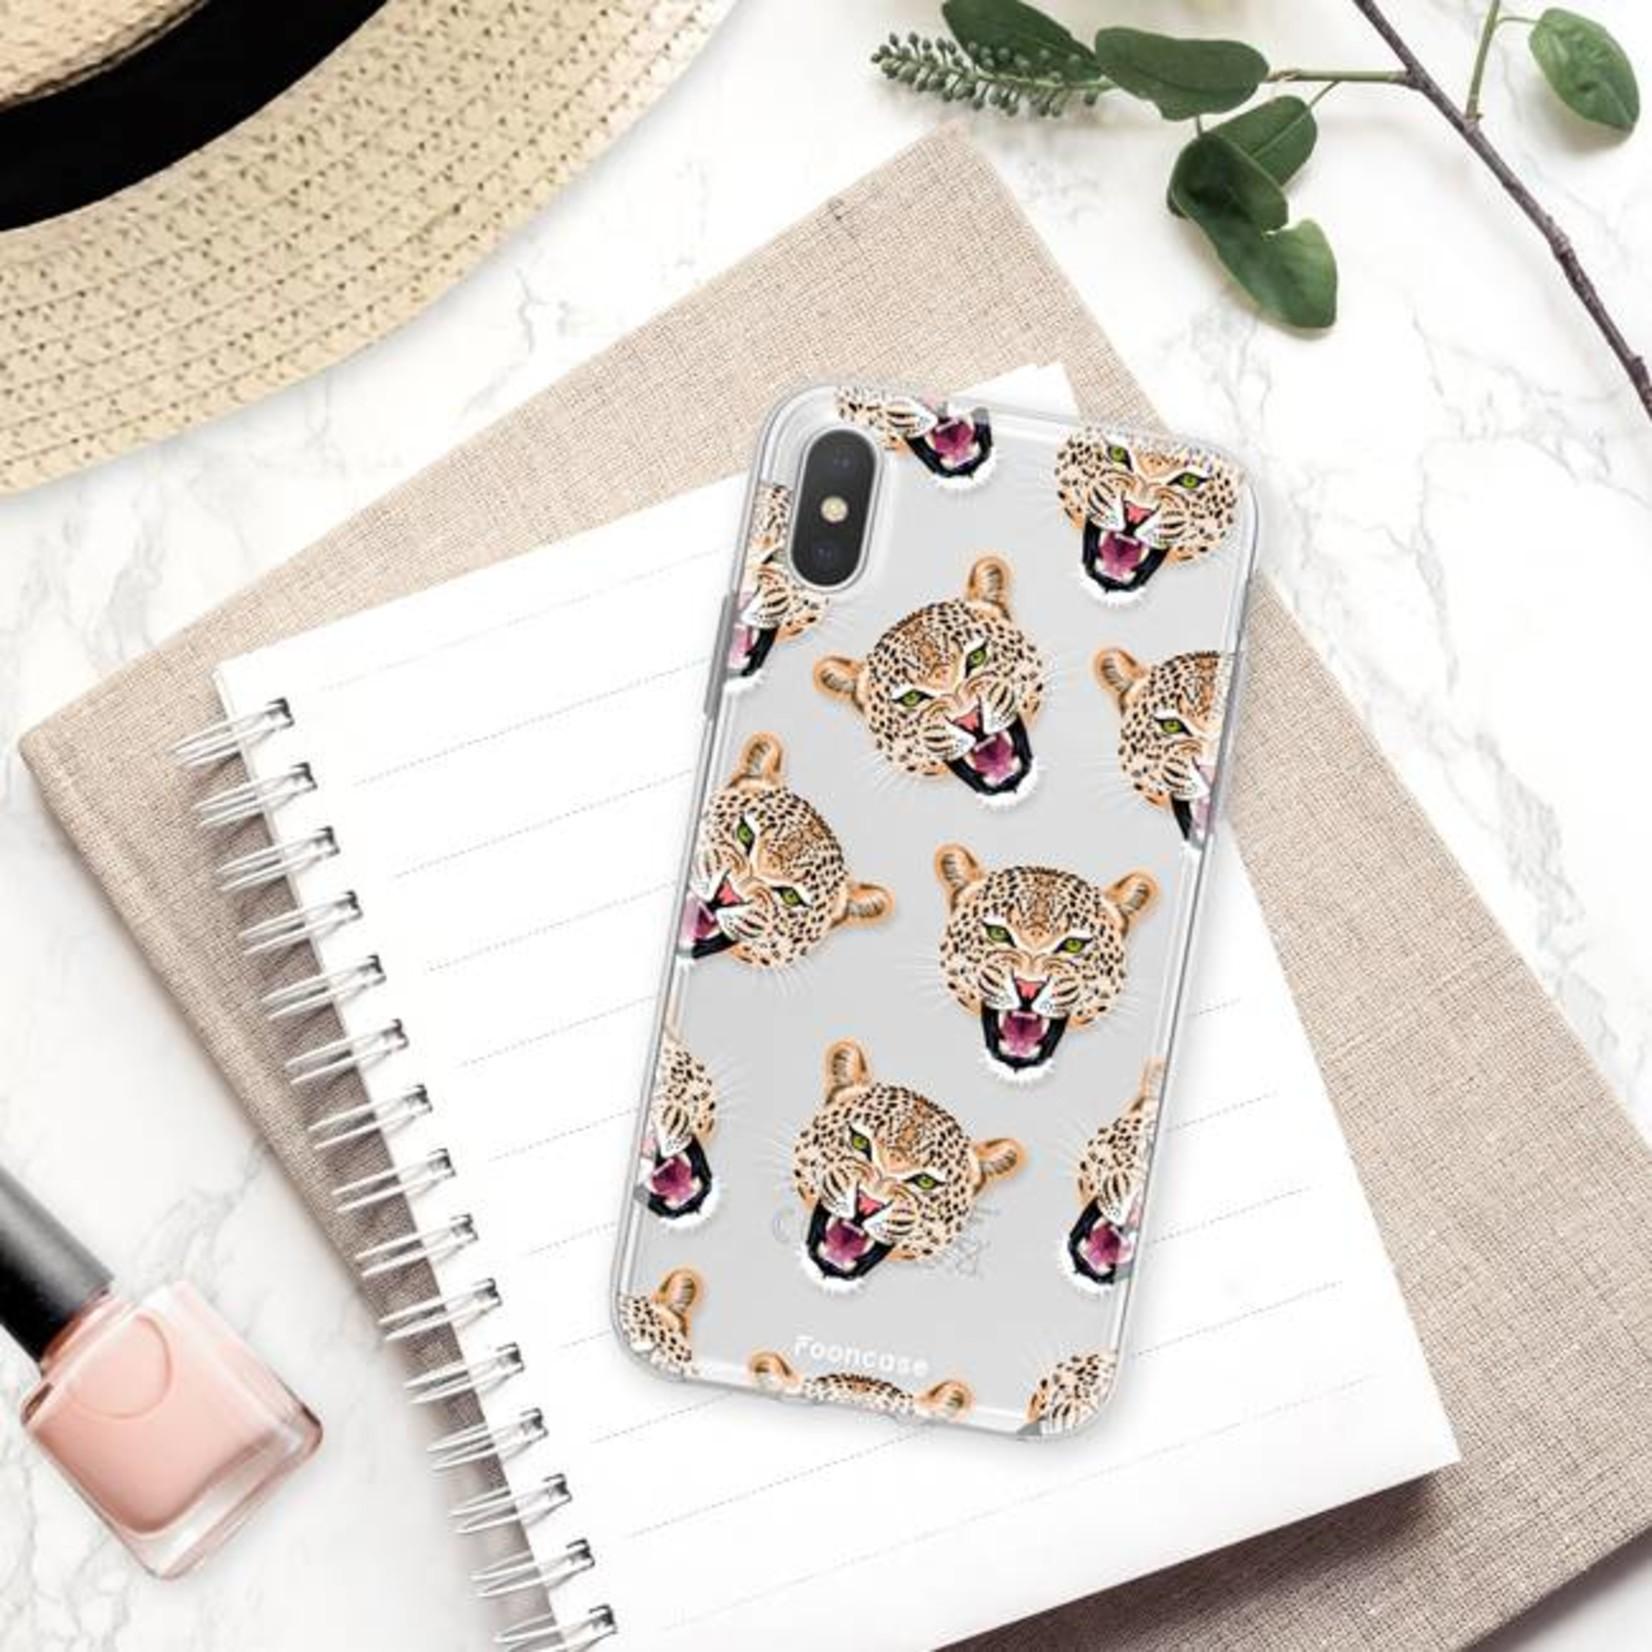 FOONCASE Iphone X Handyhülle - Cheeky Leopard